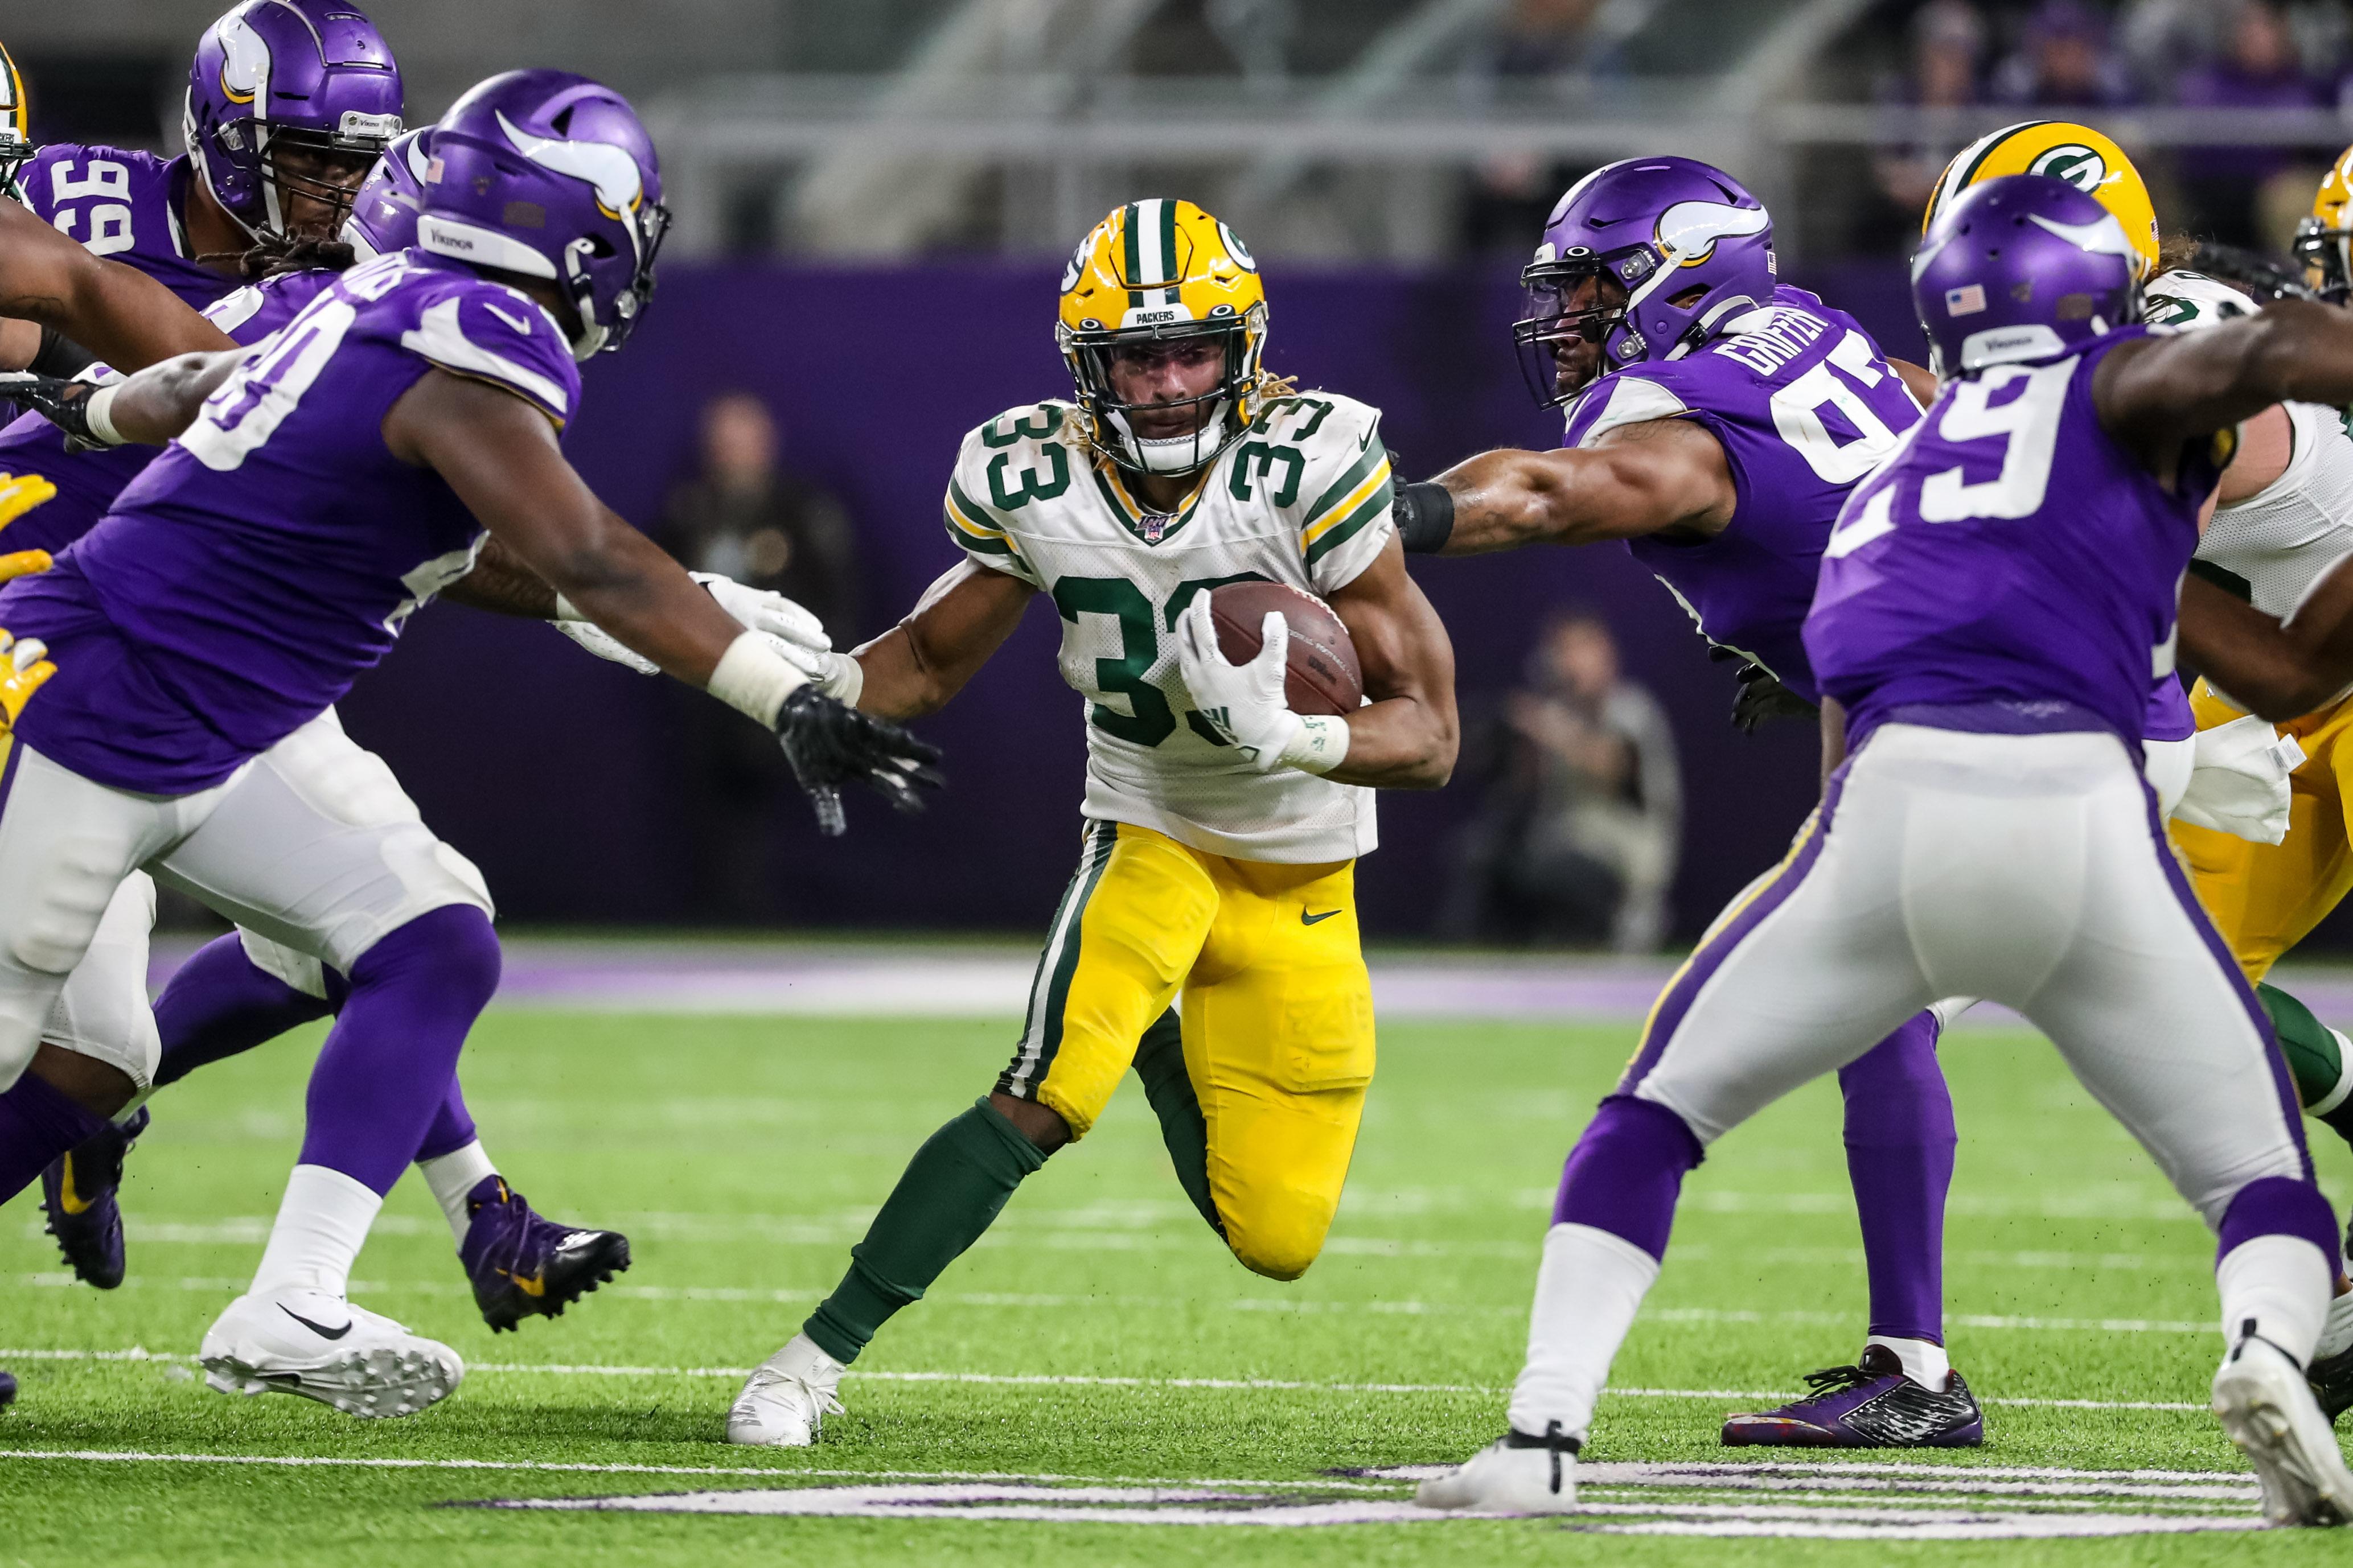 Six Key Factors That Will Determine the Winner of Packers vs. Vikings